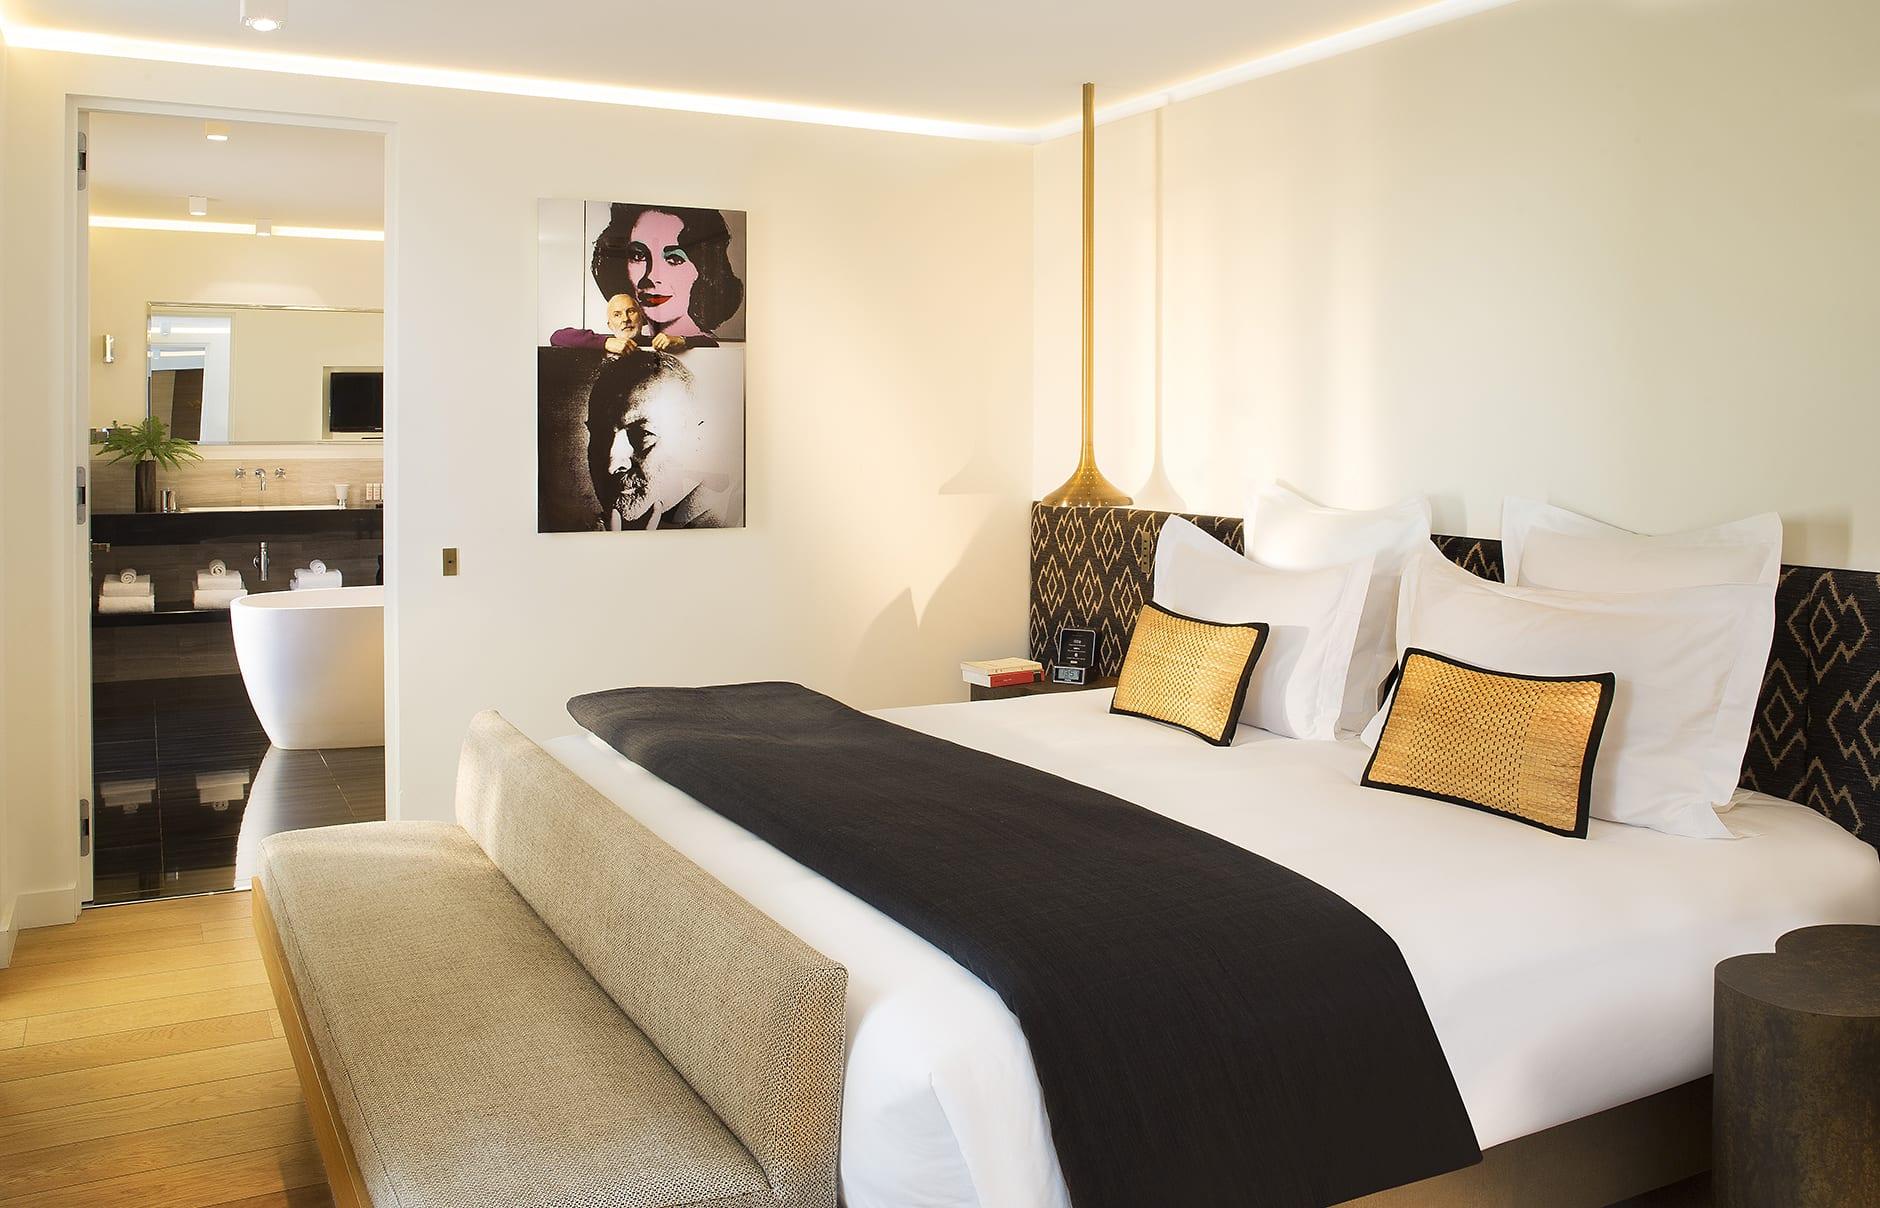 Hotel Marignan Champs-Elysées, Paris, France. Hotel Review by TravelPlusStyle. Photo © Marignan